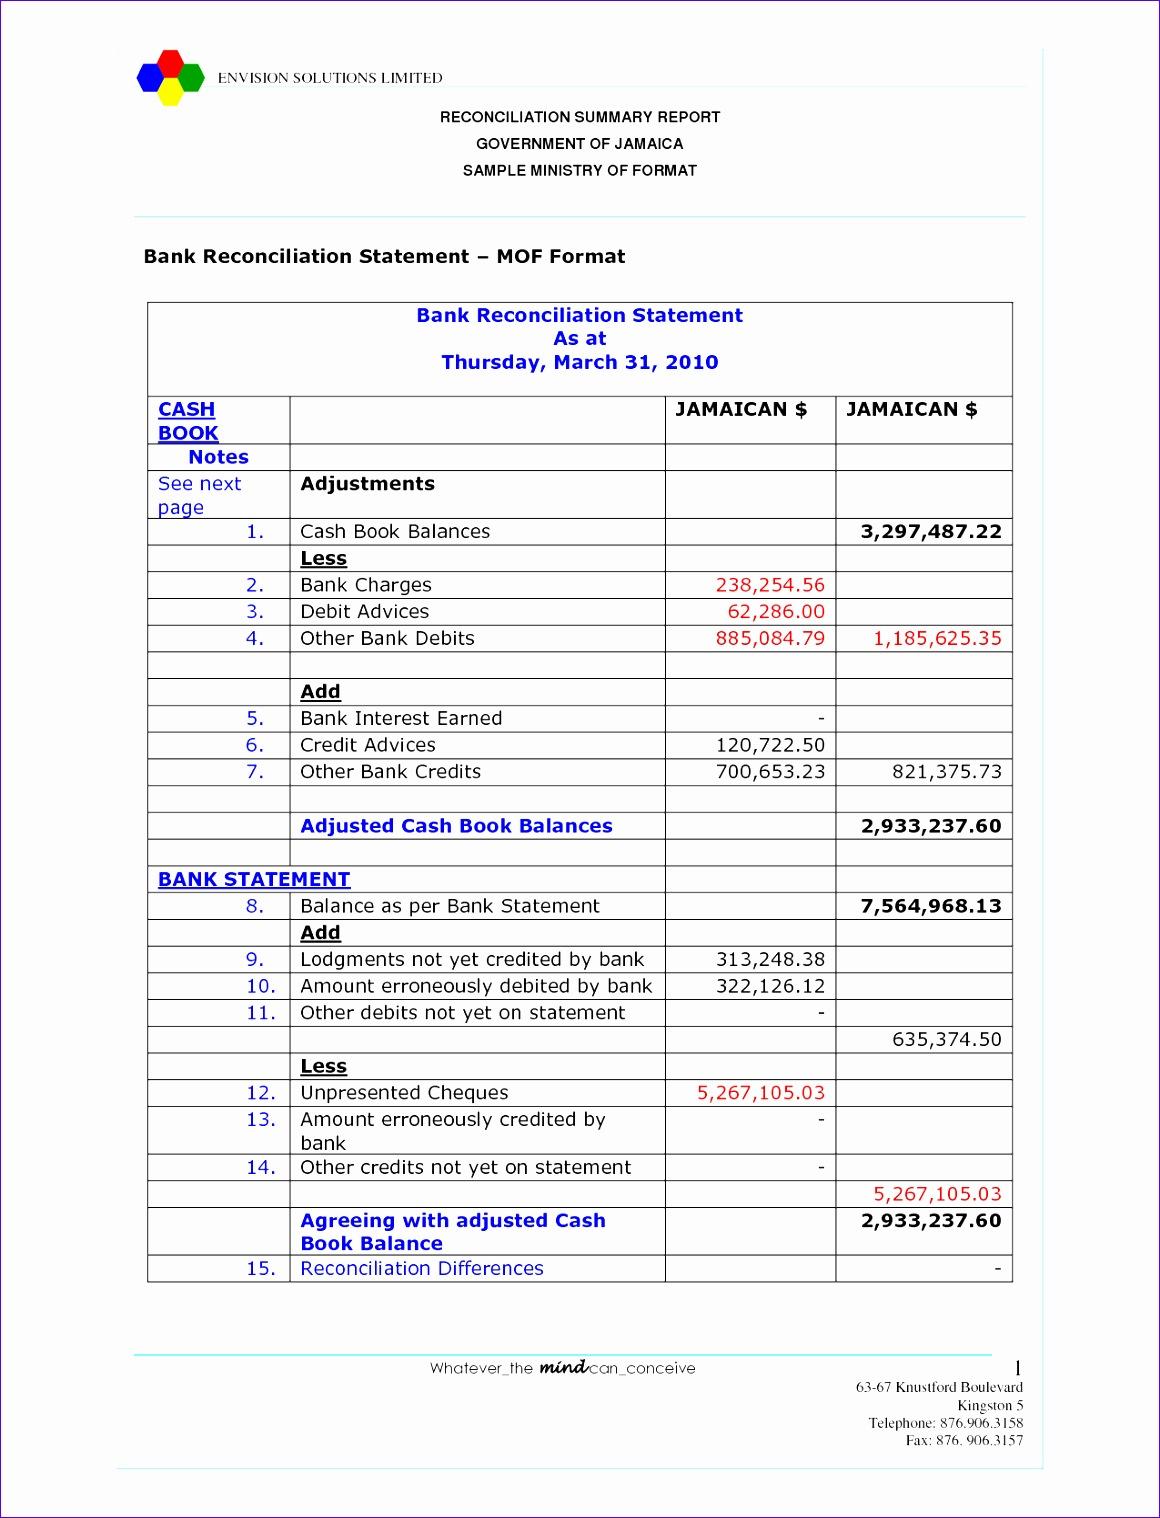 Bank Statement Template Excel N6orr Lovely Bank Statement Reconciliation Worksheet Chriswoodfans 12751650